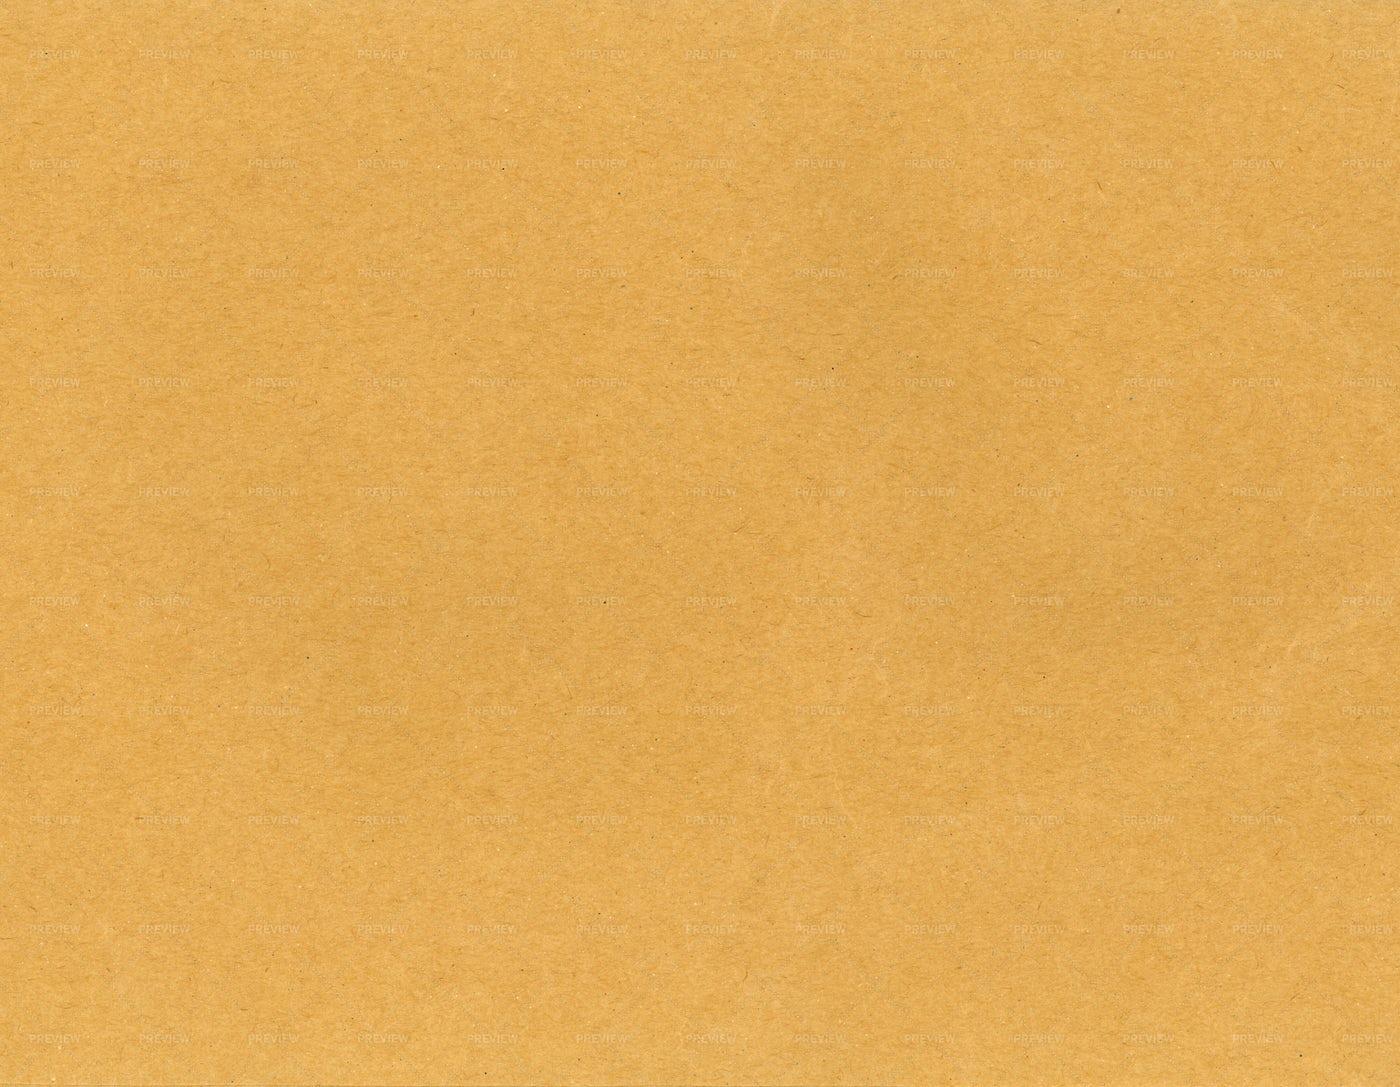 Brown Paper: Stock Photos